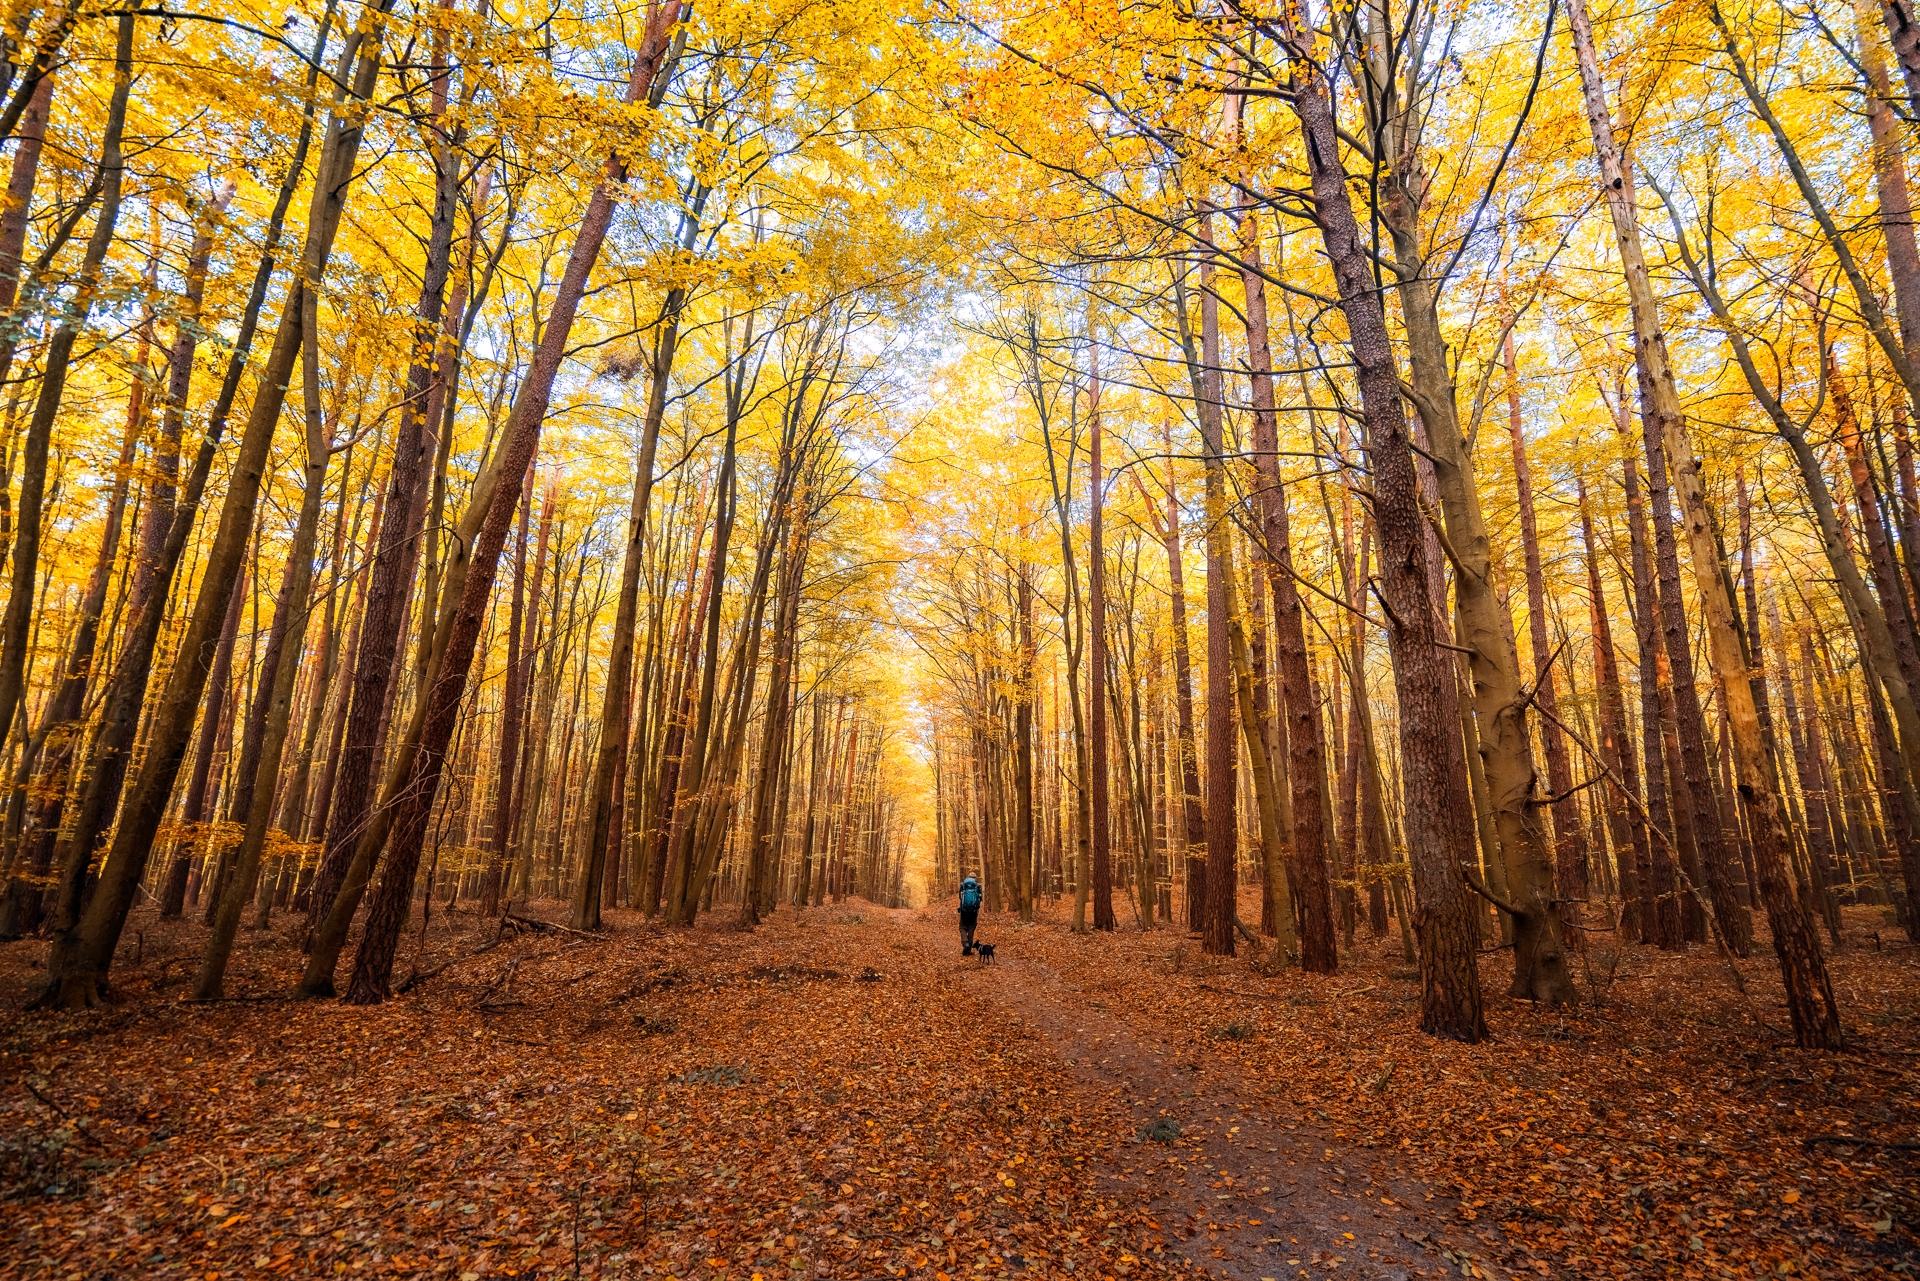 Splendid autumn foliages spotte - phigun | ello